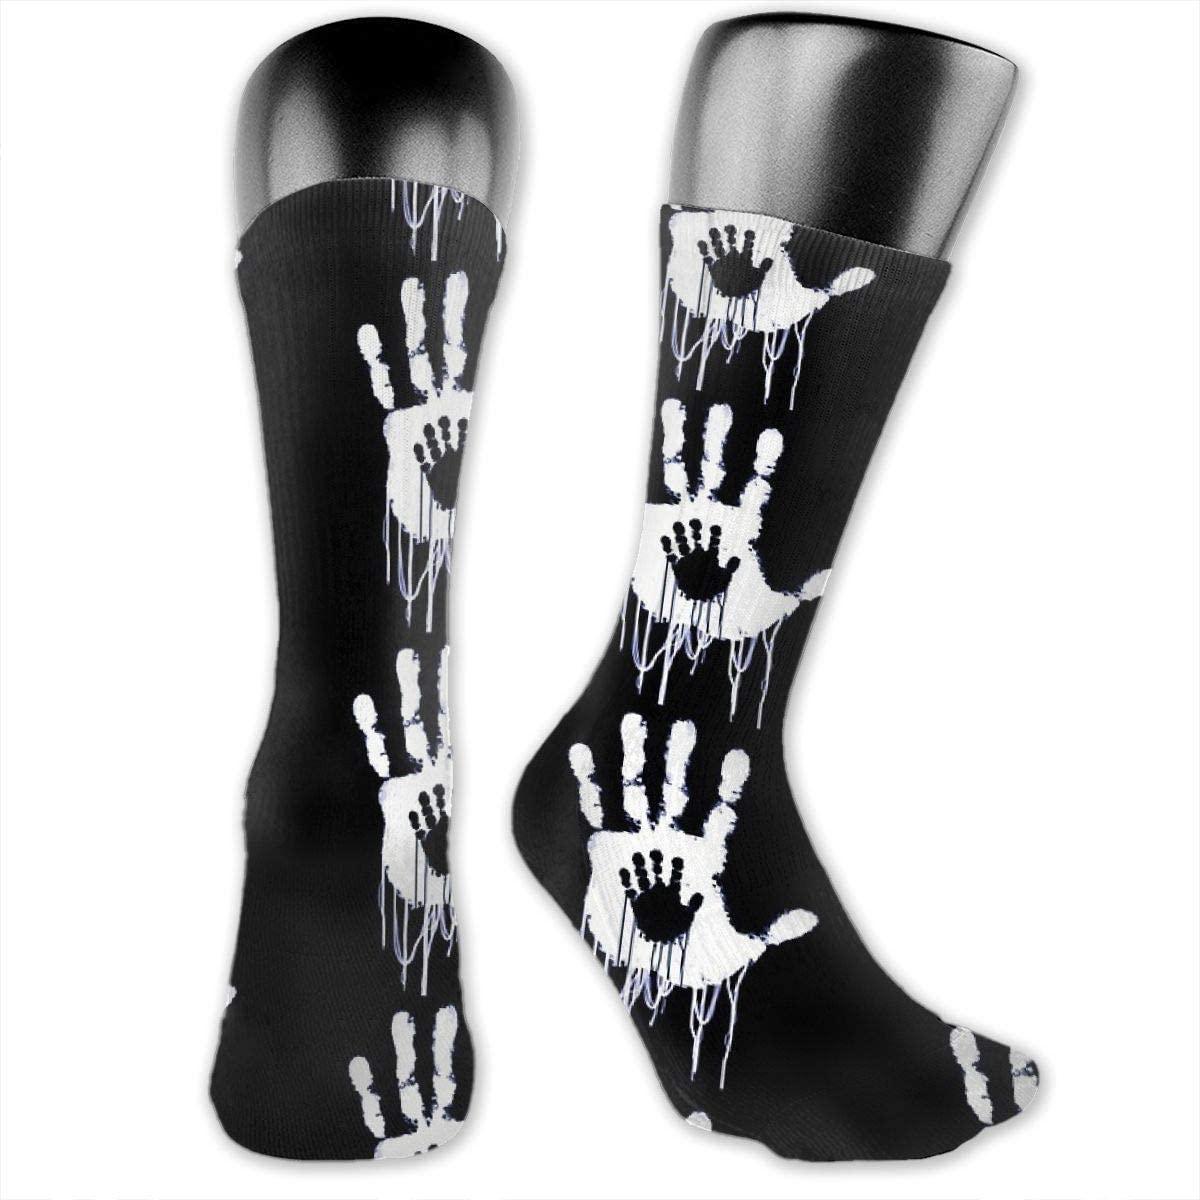 Unisex Crazy Funny Cool 3D Print Death Stranding Art Colorful Running Travel Socks Novelty Casual Crew Socks